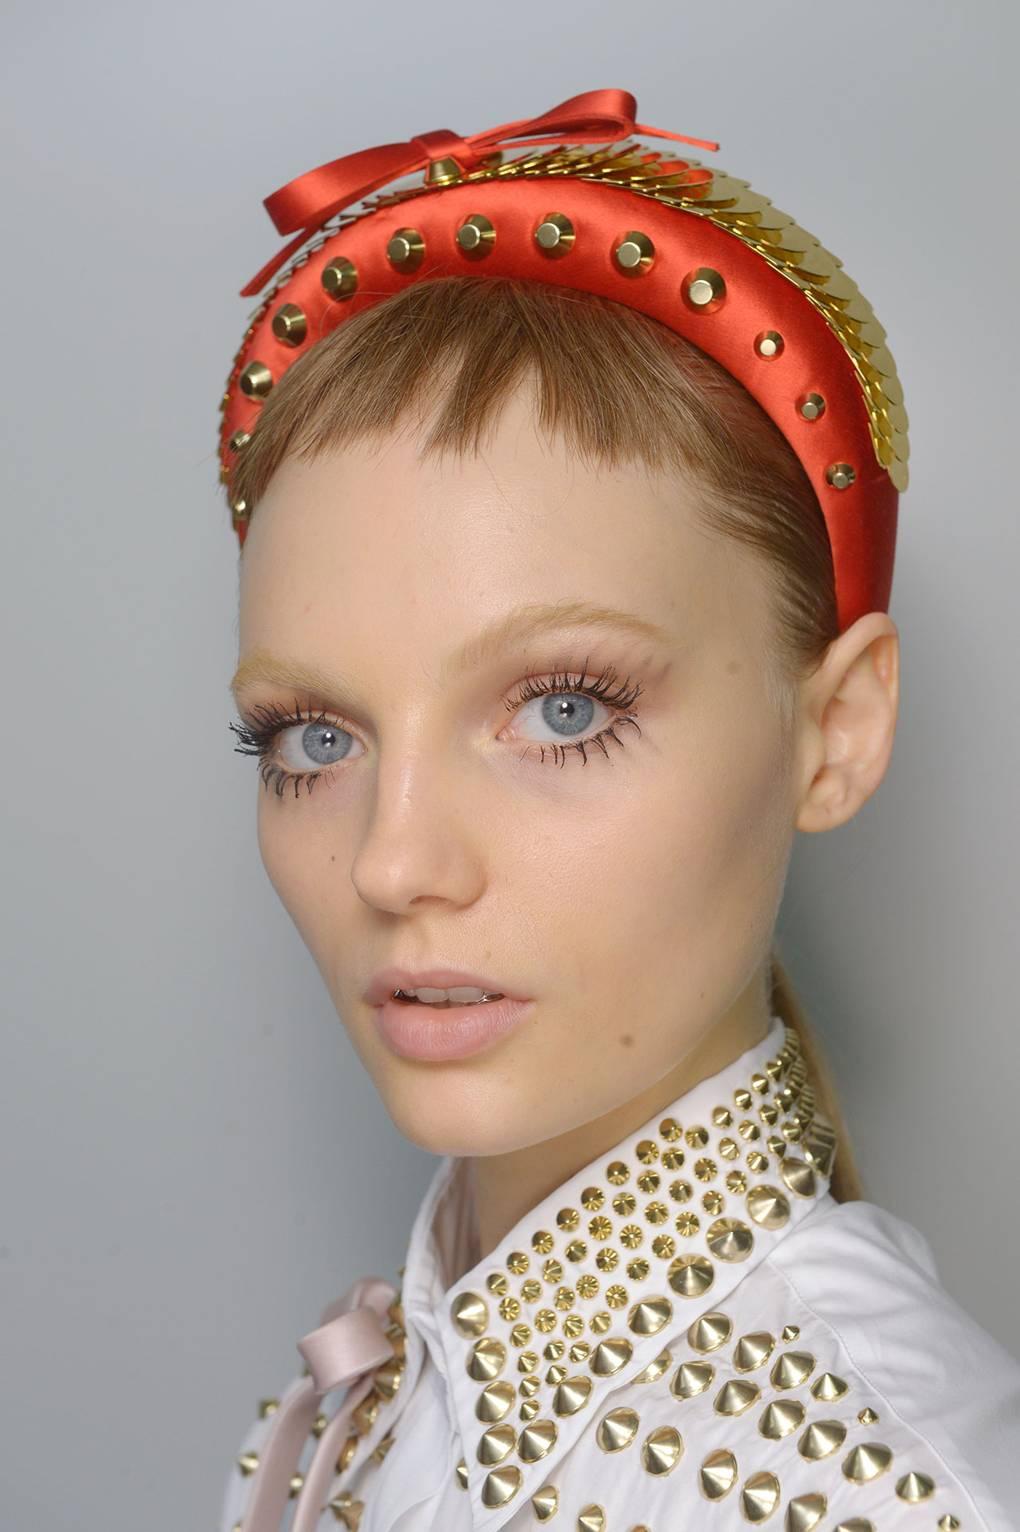 Enfants: Vêtements, Access. Baby Flower Bangs Hair Clip 30 Bag Christmas Gift Beautiful Girl Jewelry Filles: Accessoires